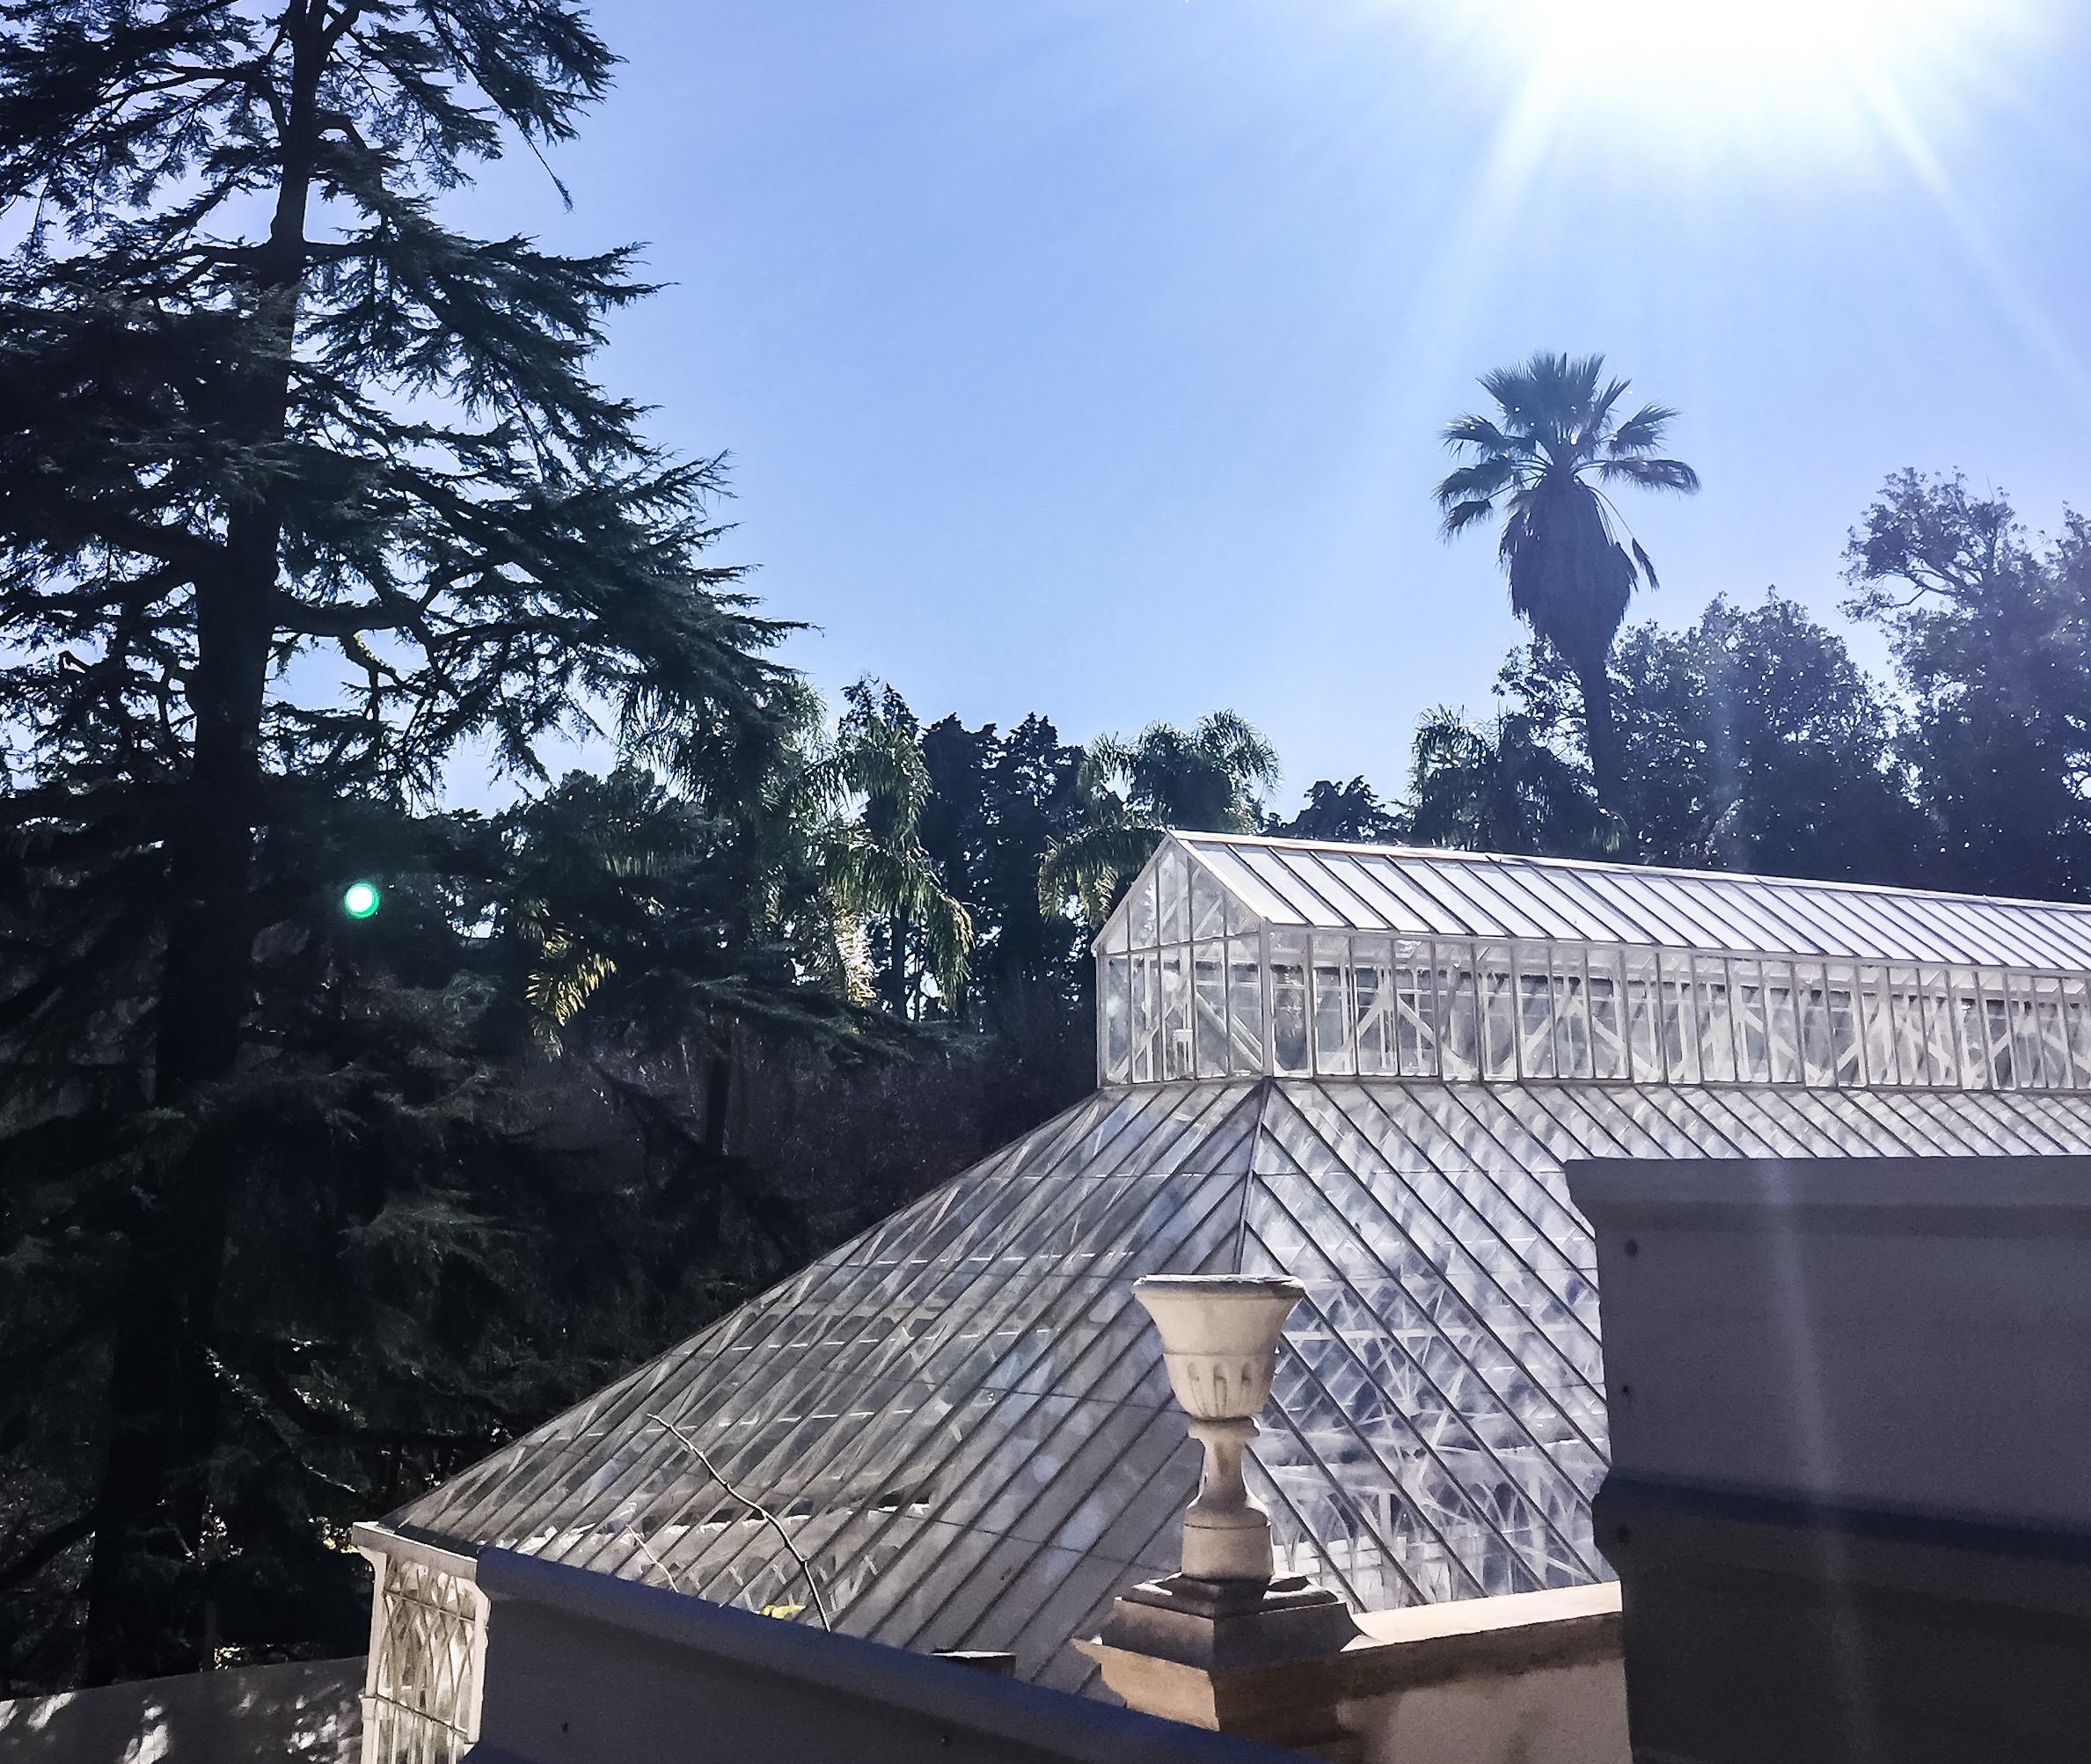 6 on 6 - Lugares que Gostamos - Coimbra, Jardim Botânico